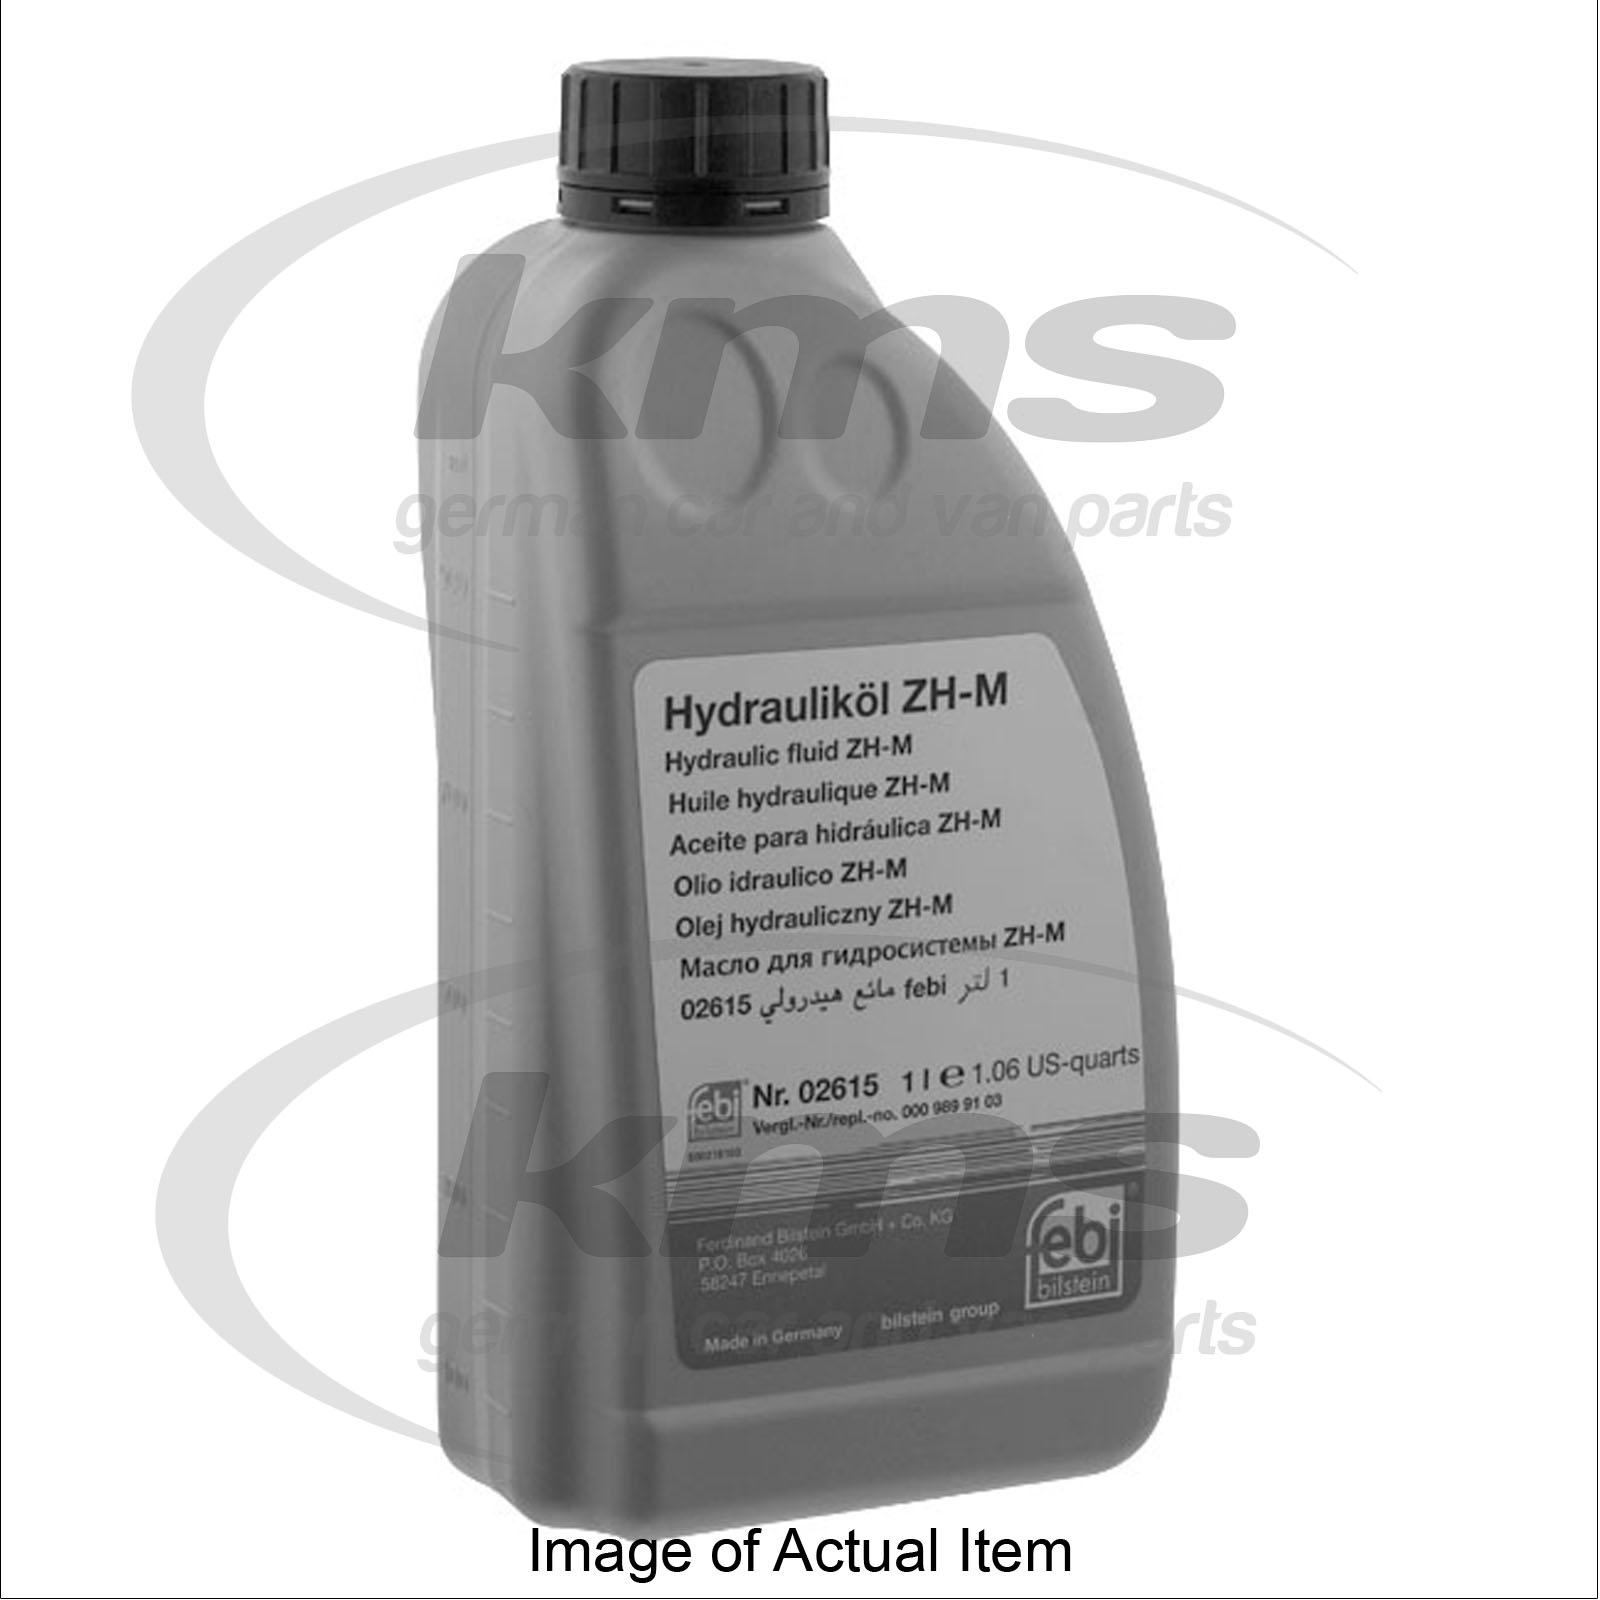 Hydraulic fluid zhm 1 litre mercedes benz 190 series for Mercedes benz hydraulic fluid